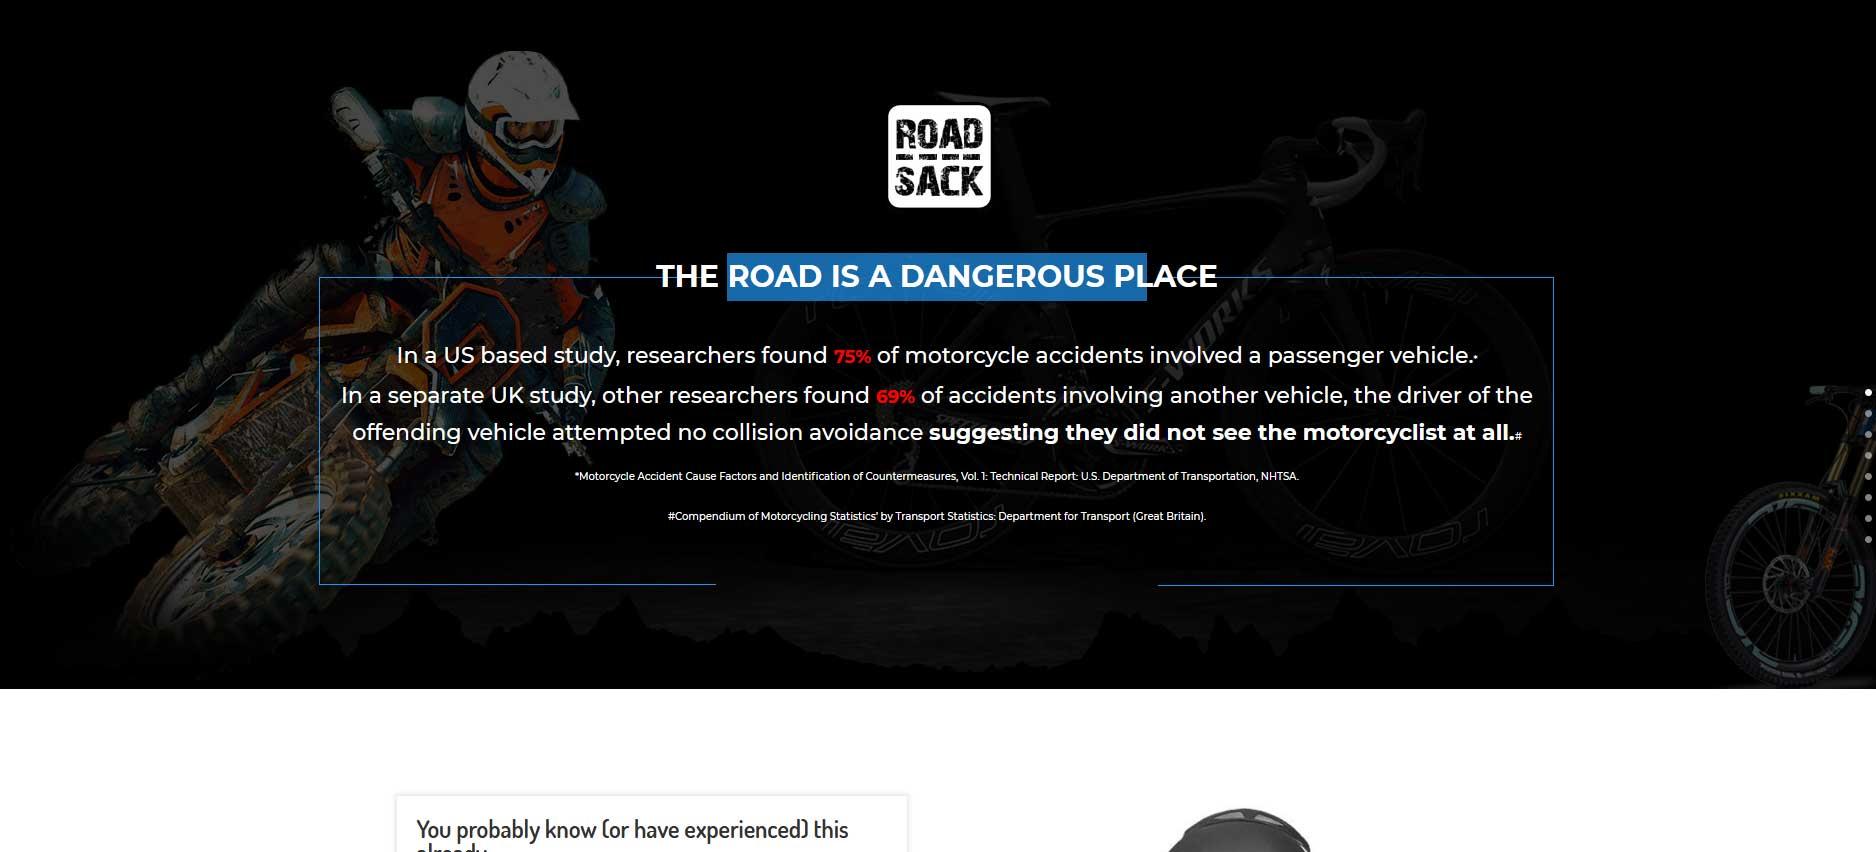 Road-sack